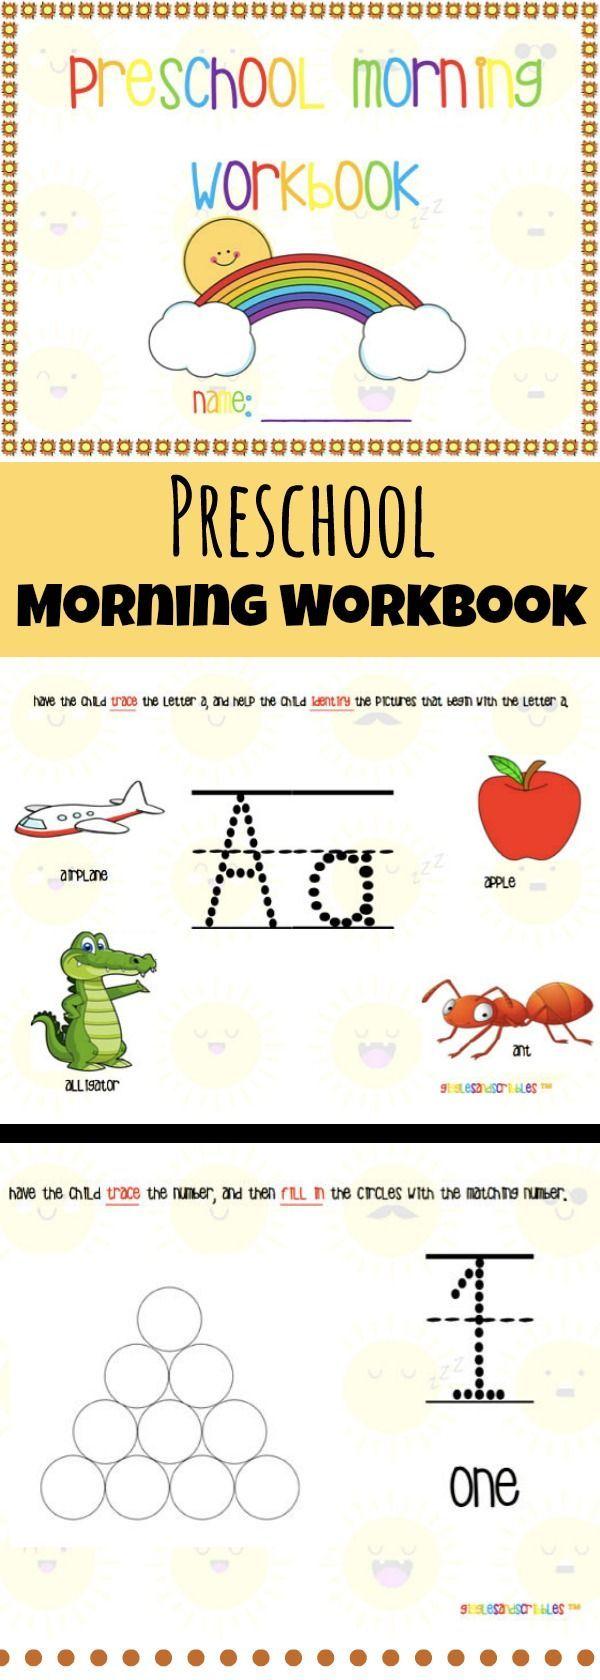 Workbooks prek workbooks : 9065 best Learning images on Pinterest | Preschool activities ...